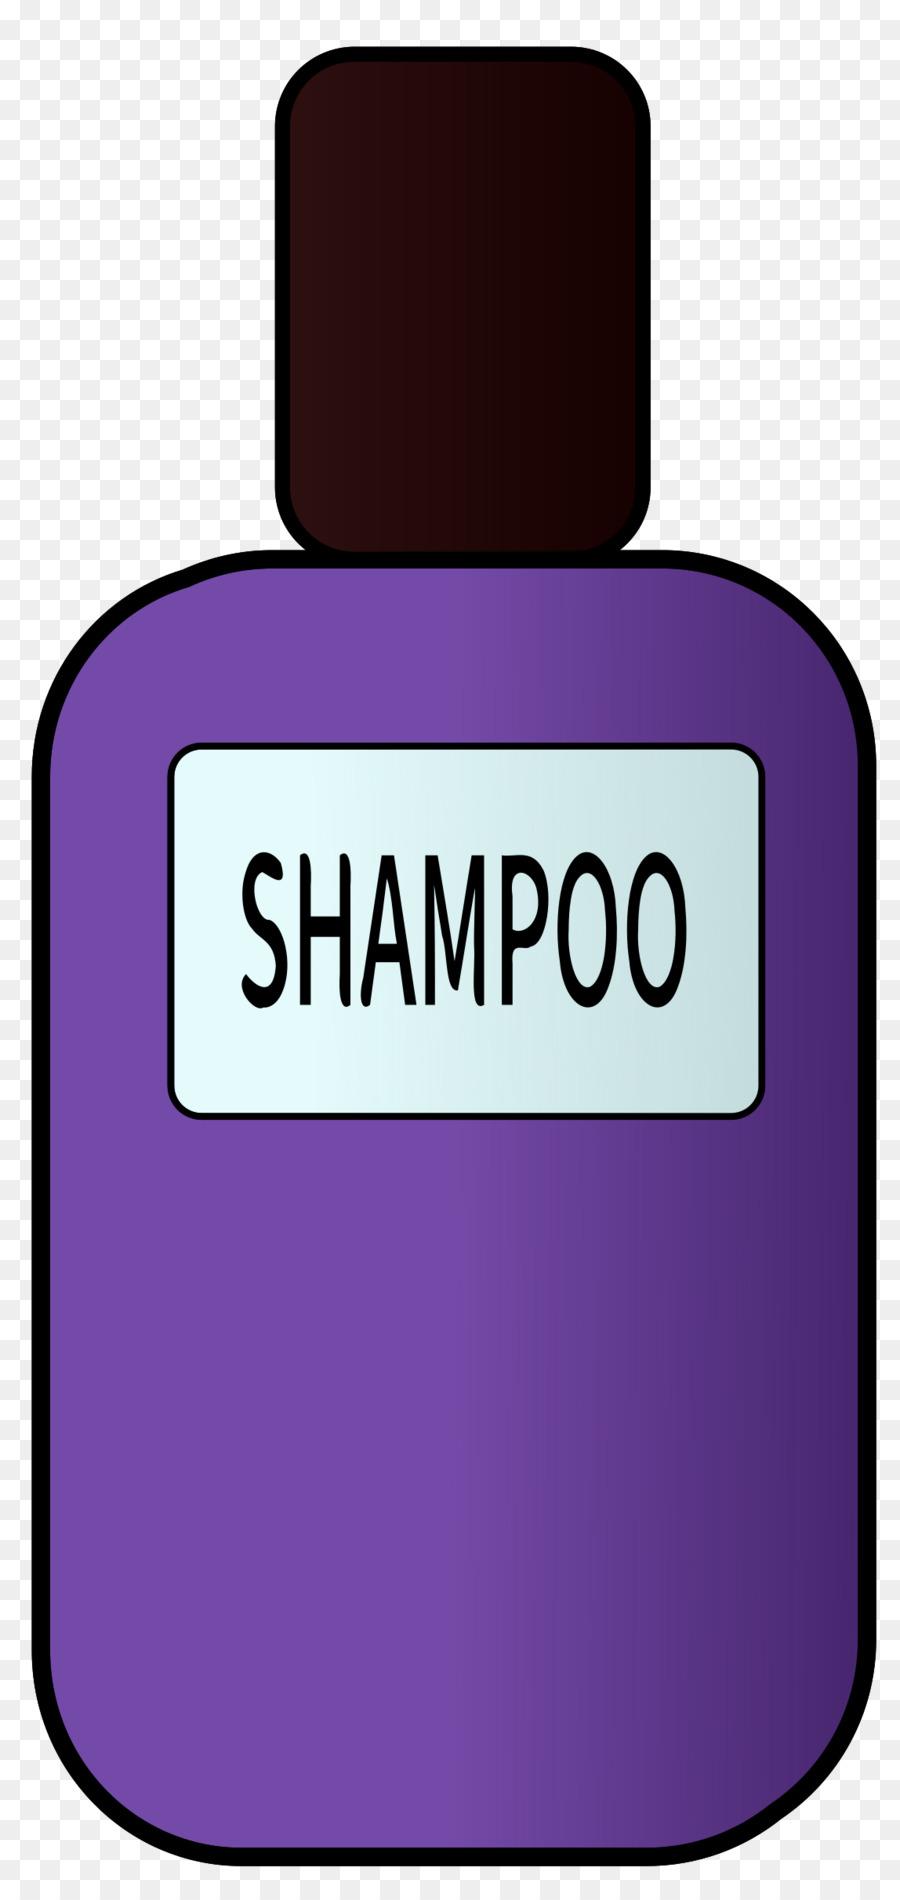 Shampoo clipart cartoon. Hair perfume purple transparent